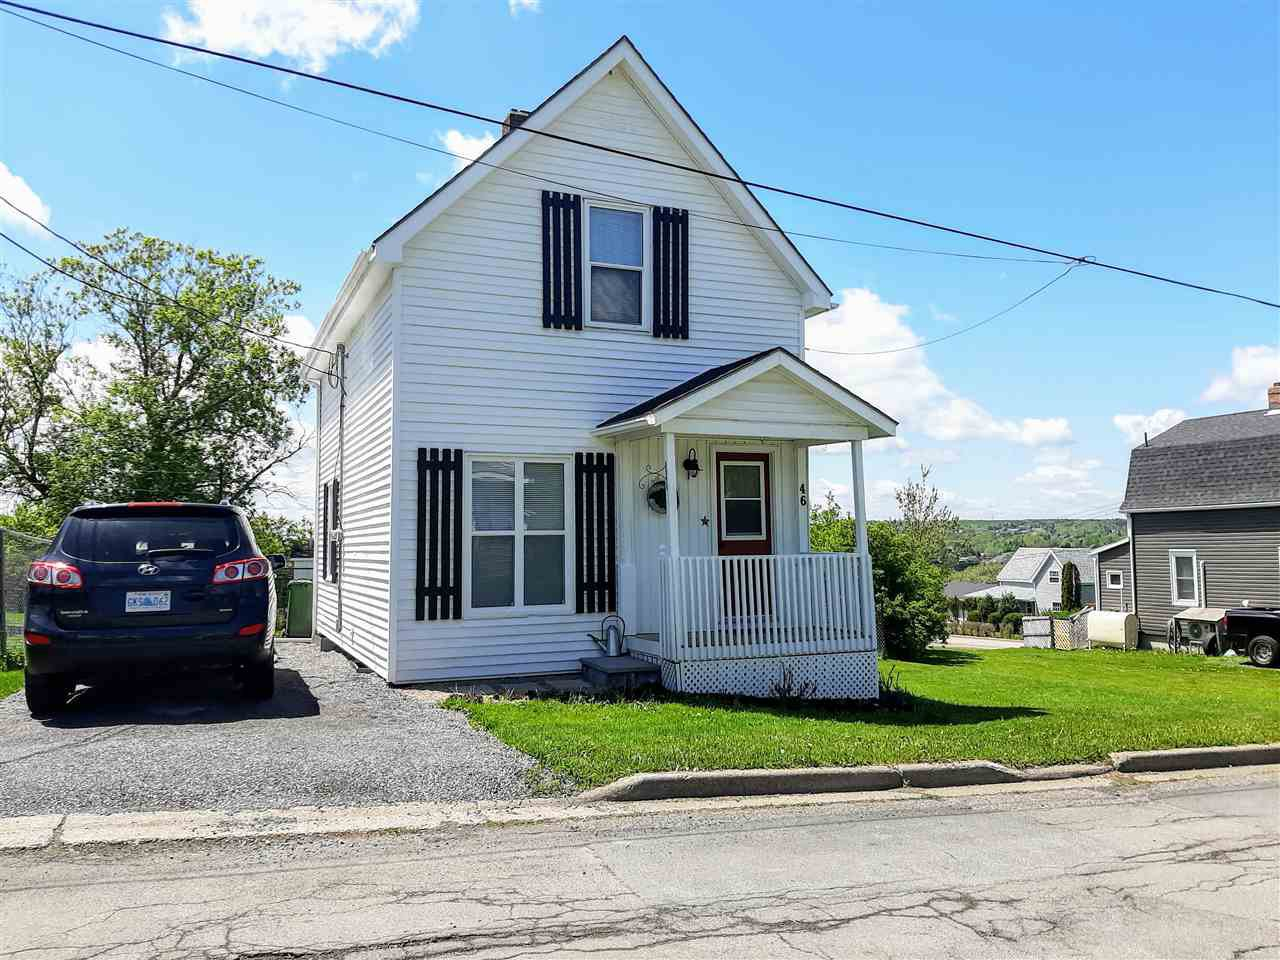 Main Photo: 46 Chestnut Street in Trenton: 107-Trenton,Westville,Pictou Residential for sale (Northern Region)  : MLS®# 202009712